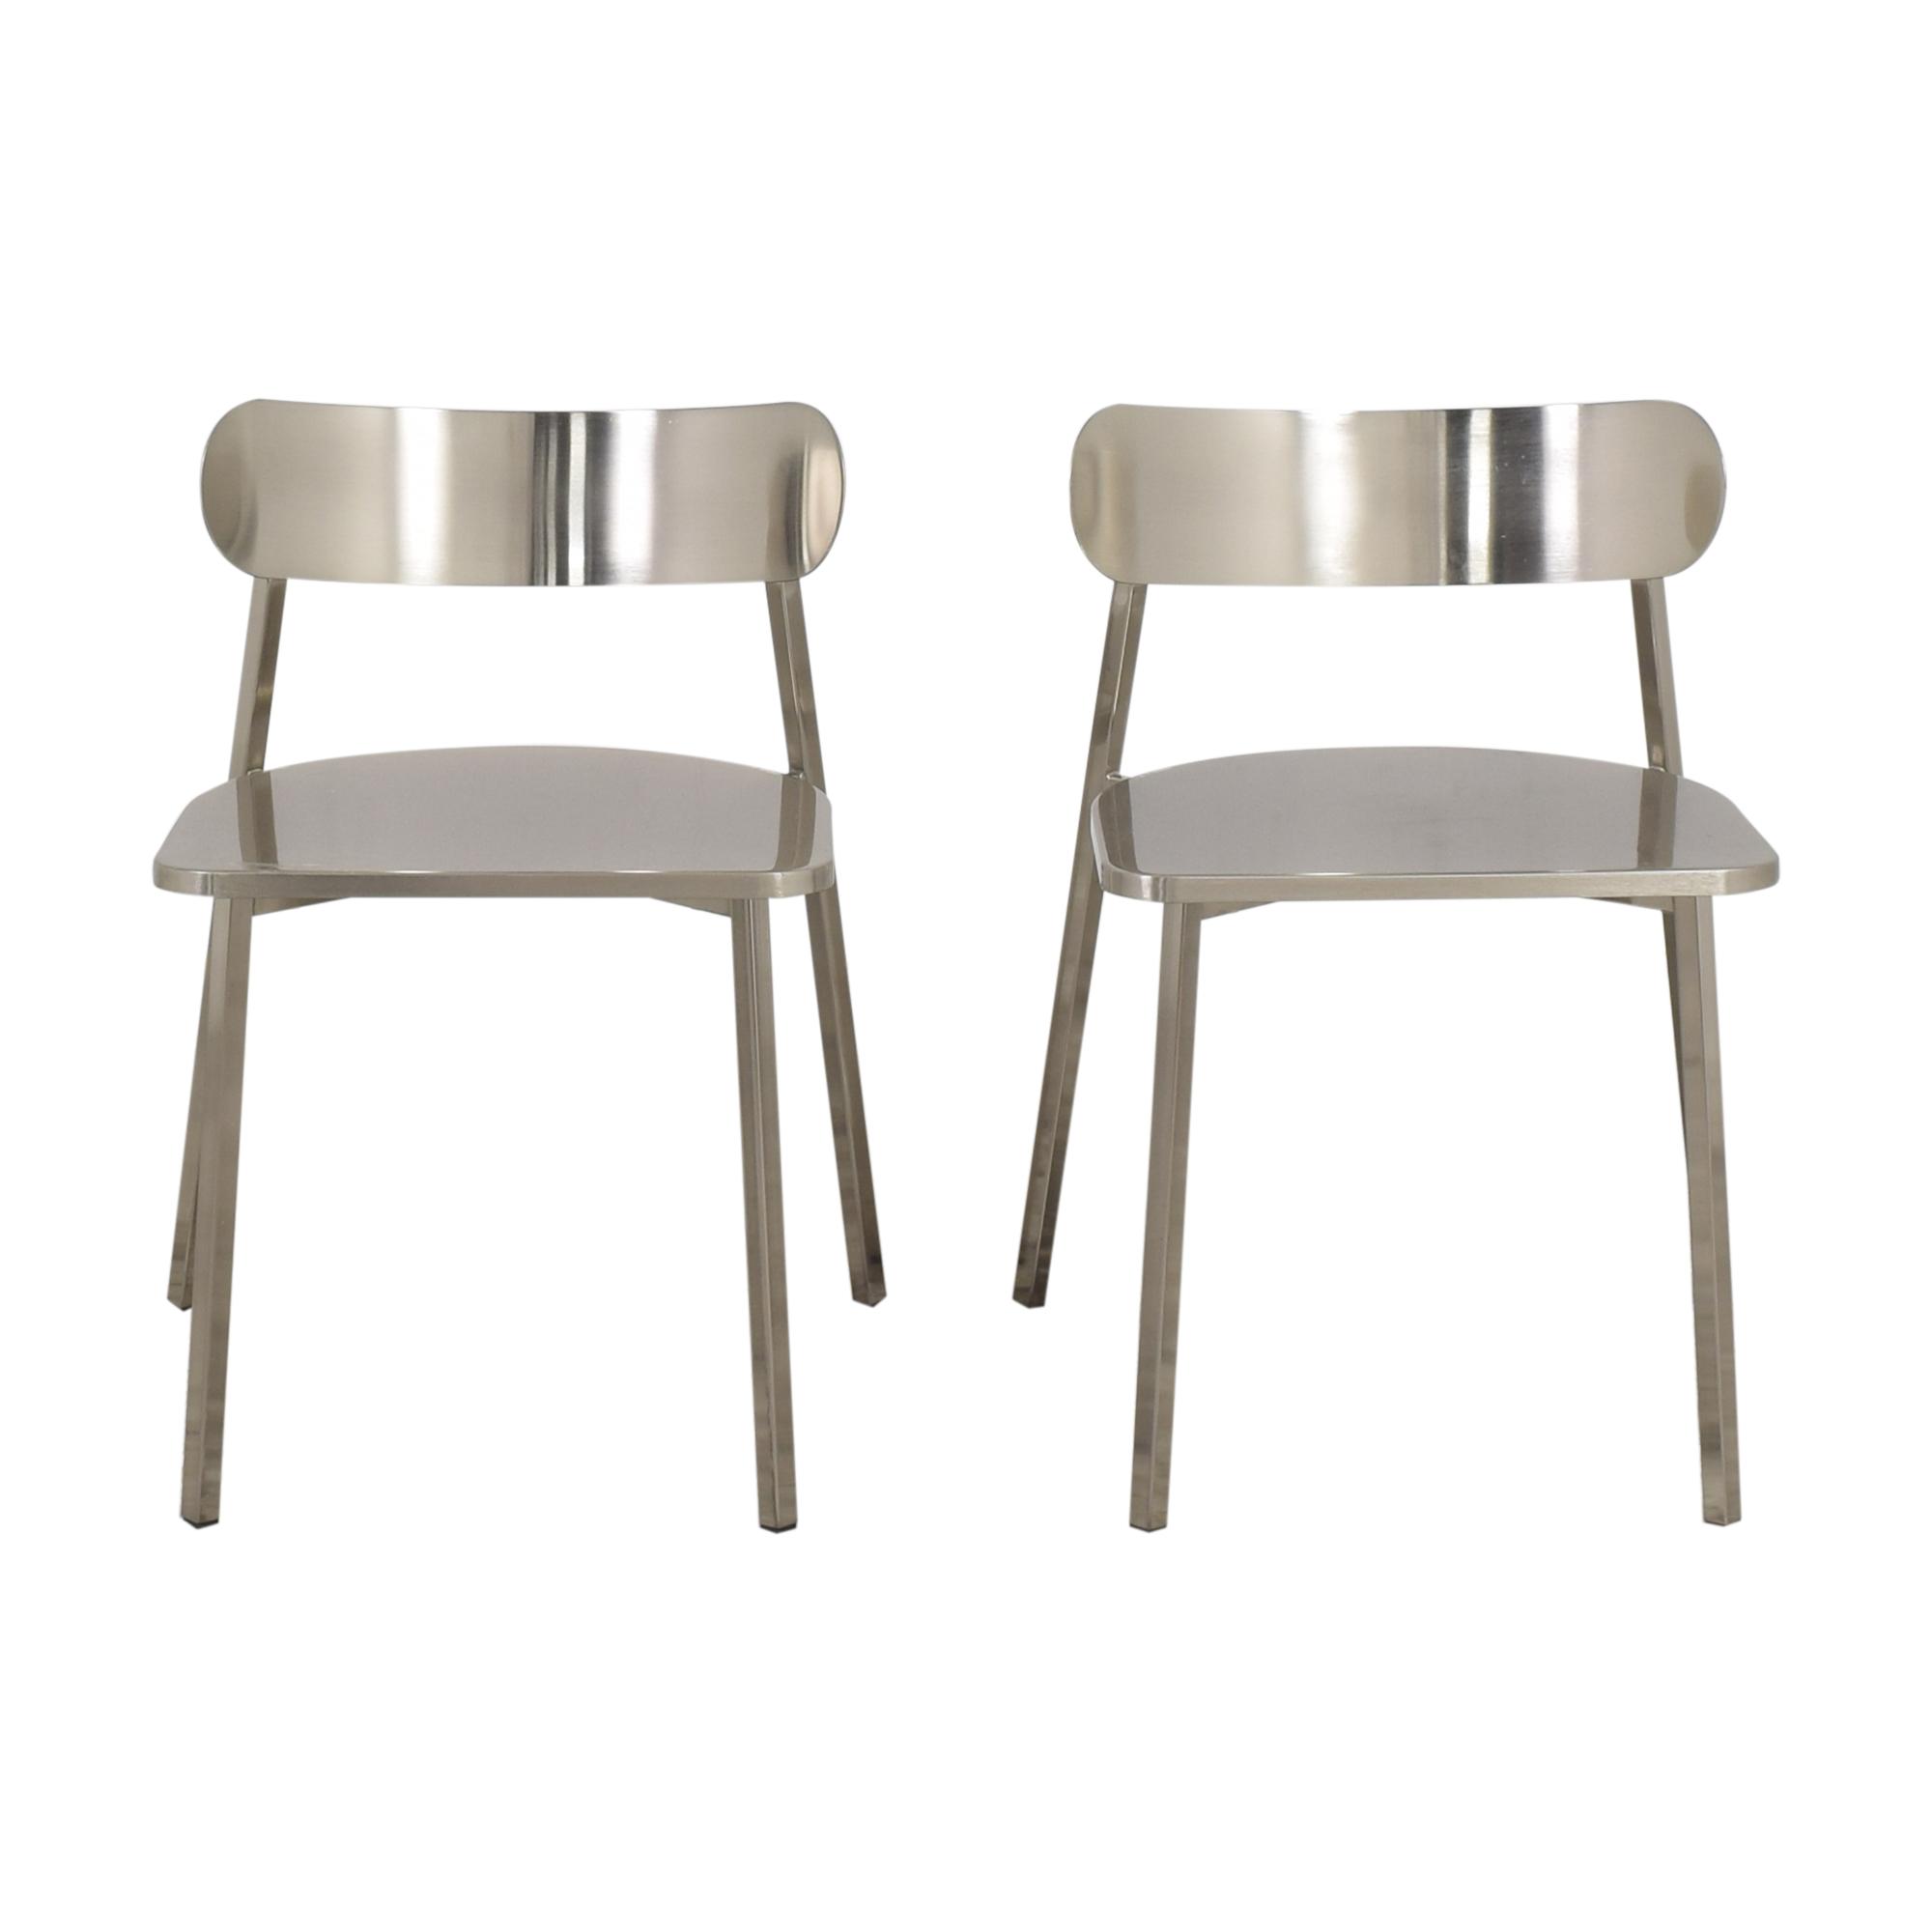 CB2 Fleet Chairs / Dining Chairs